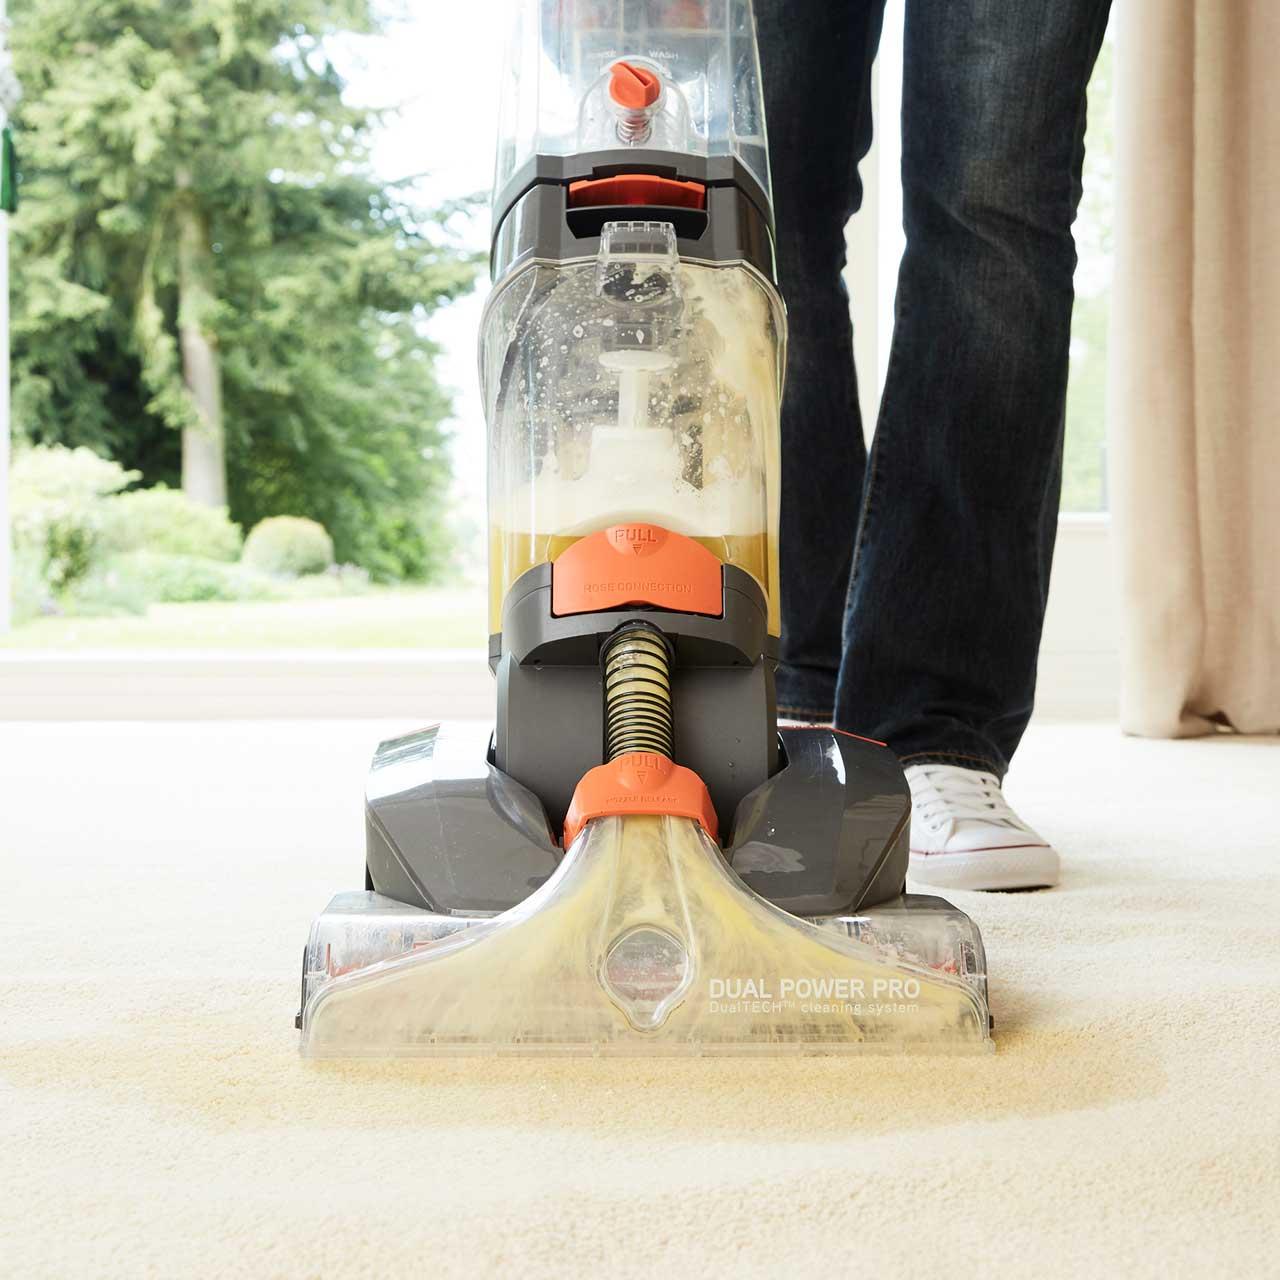 Hoover Carpet Cleaner Brush Not Spinning Scandlecandlecom